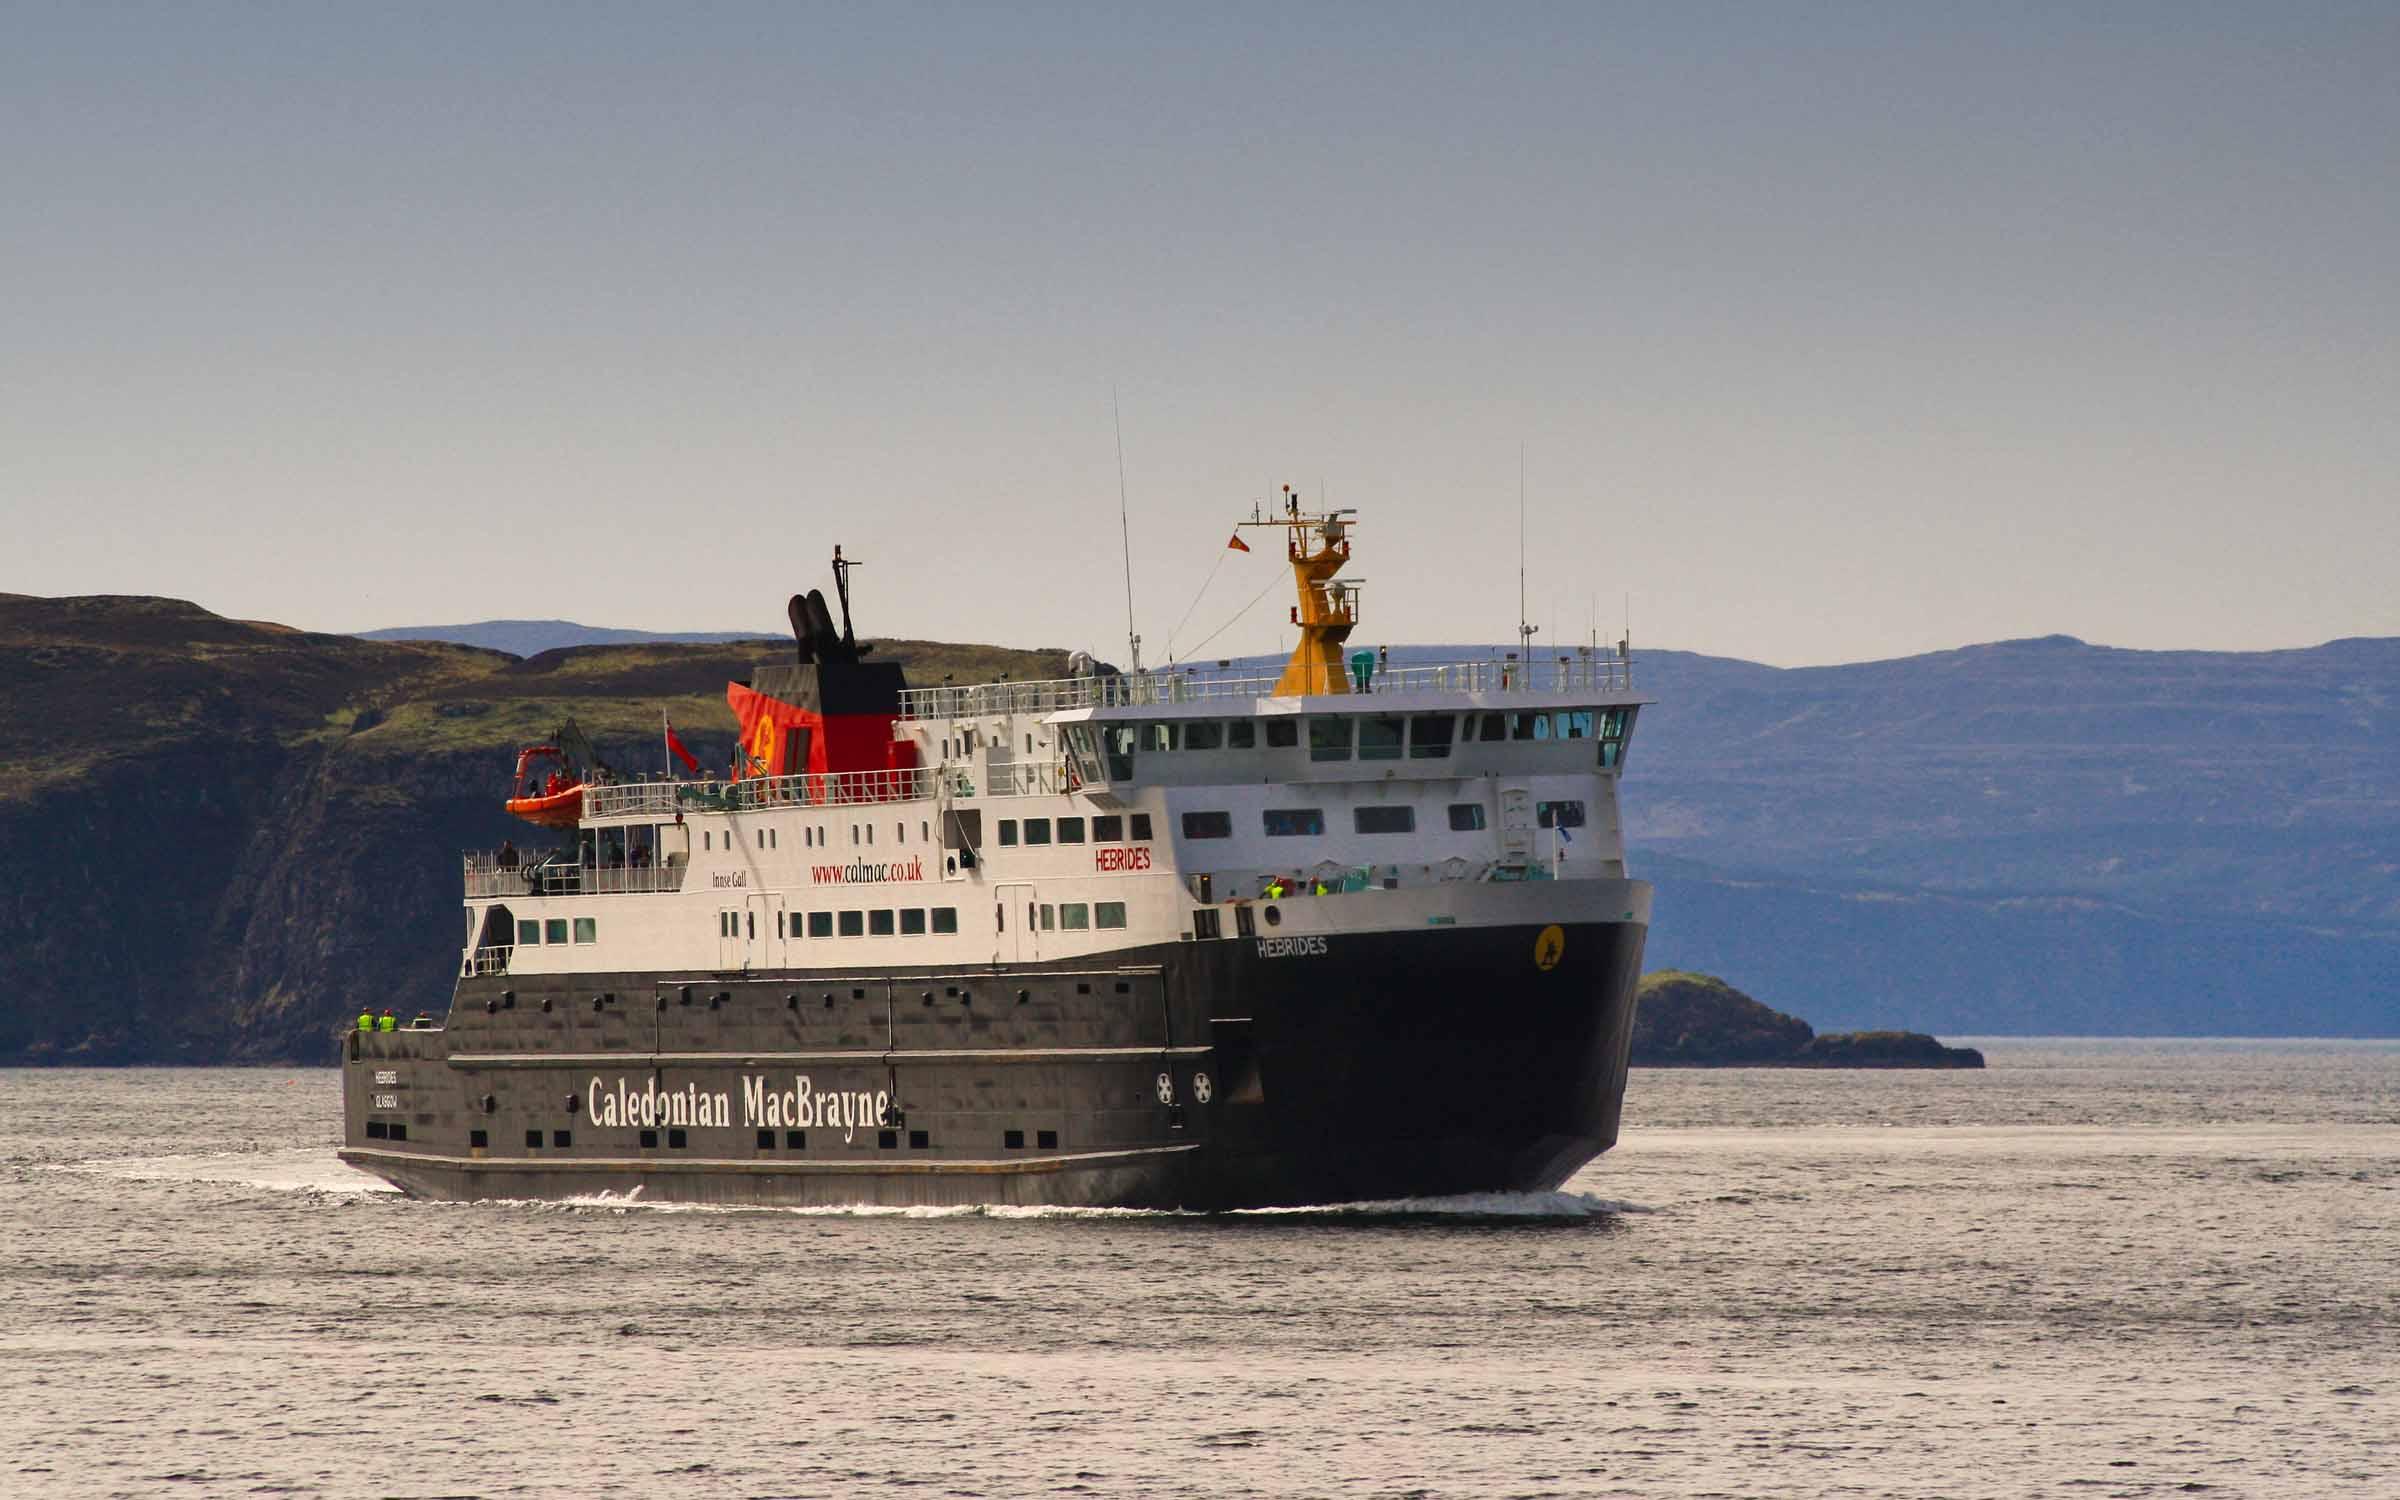 Hebrides in Uig Bay (Ships of CalMac)